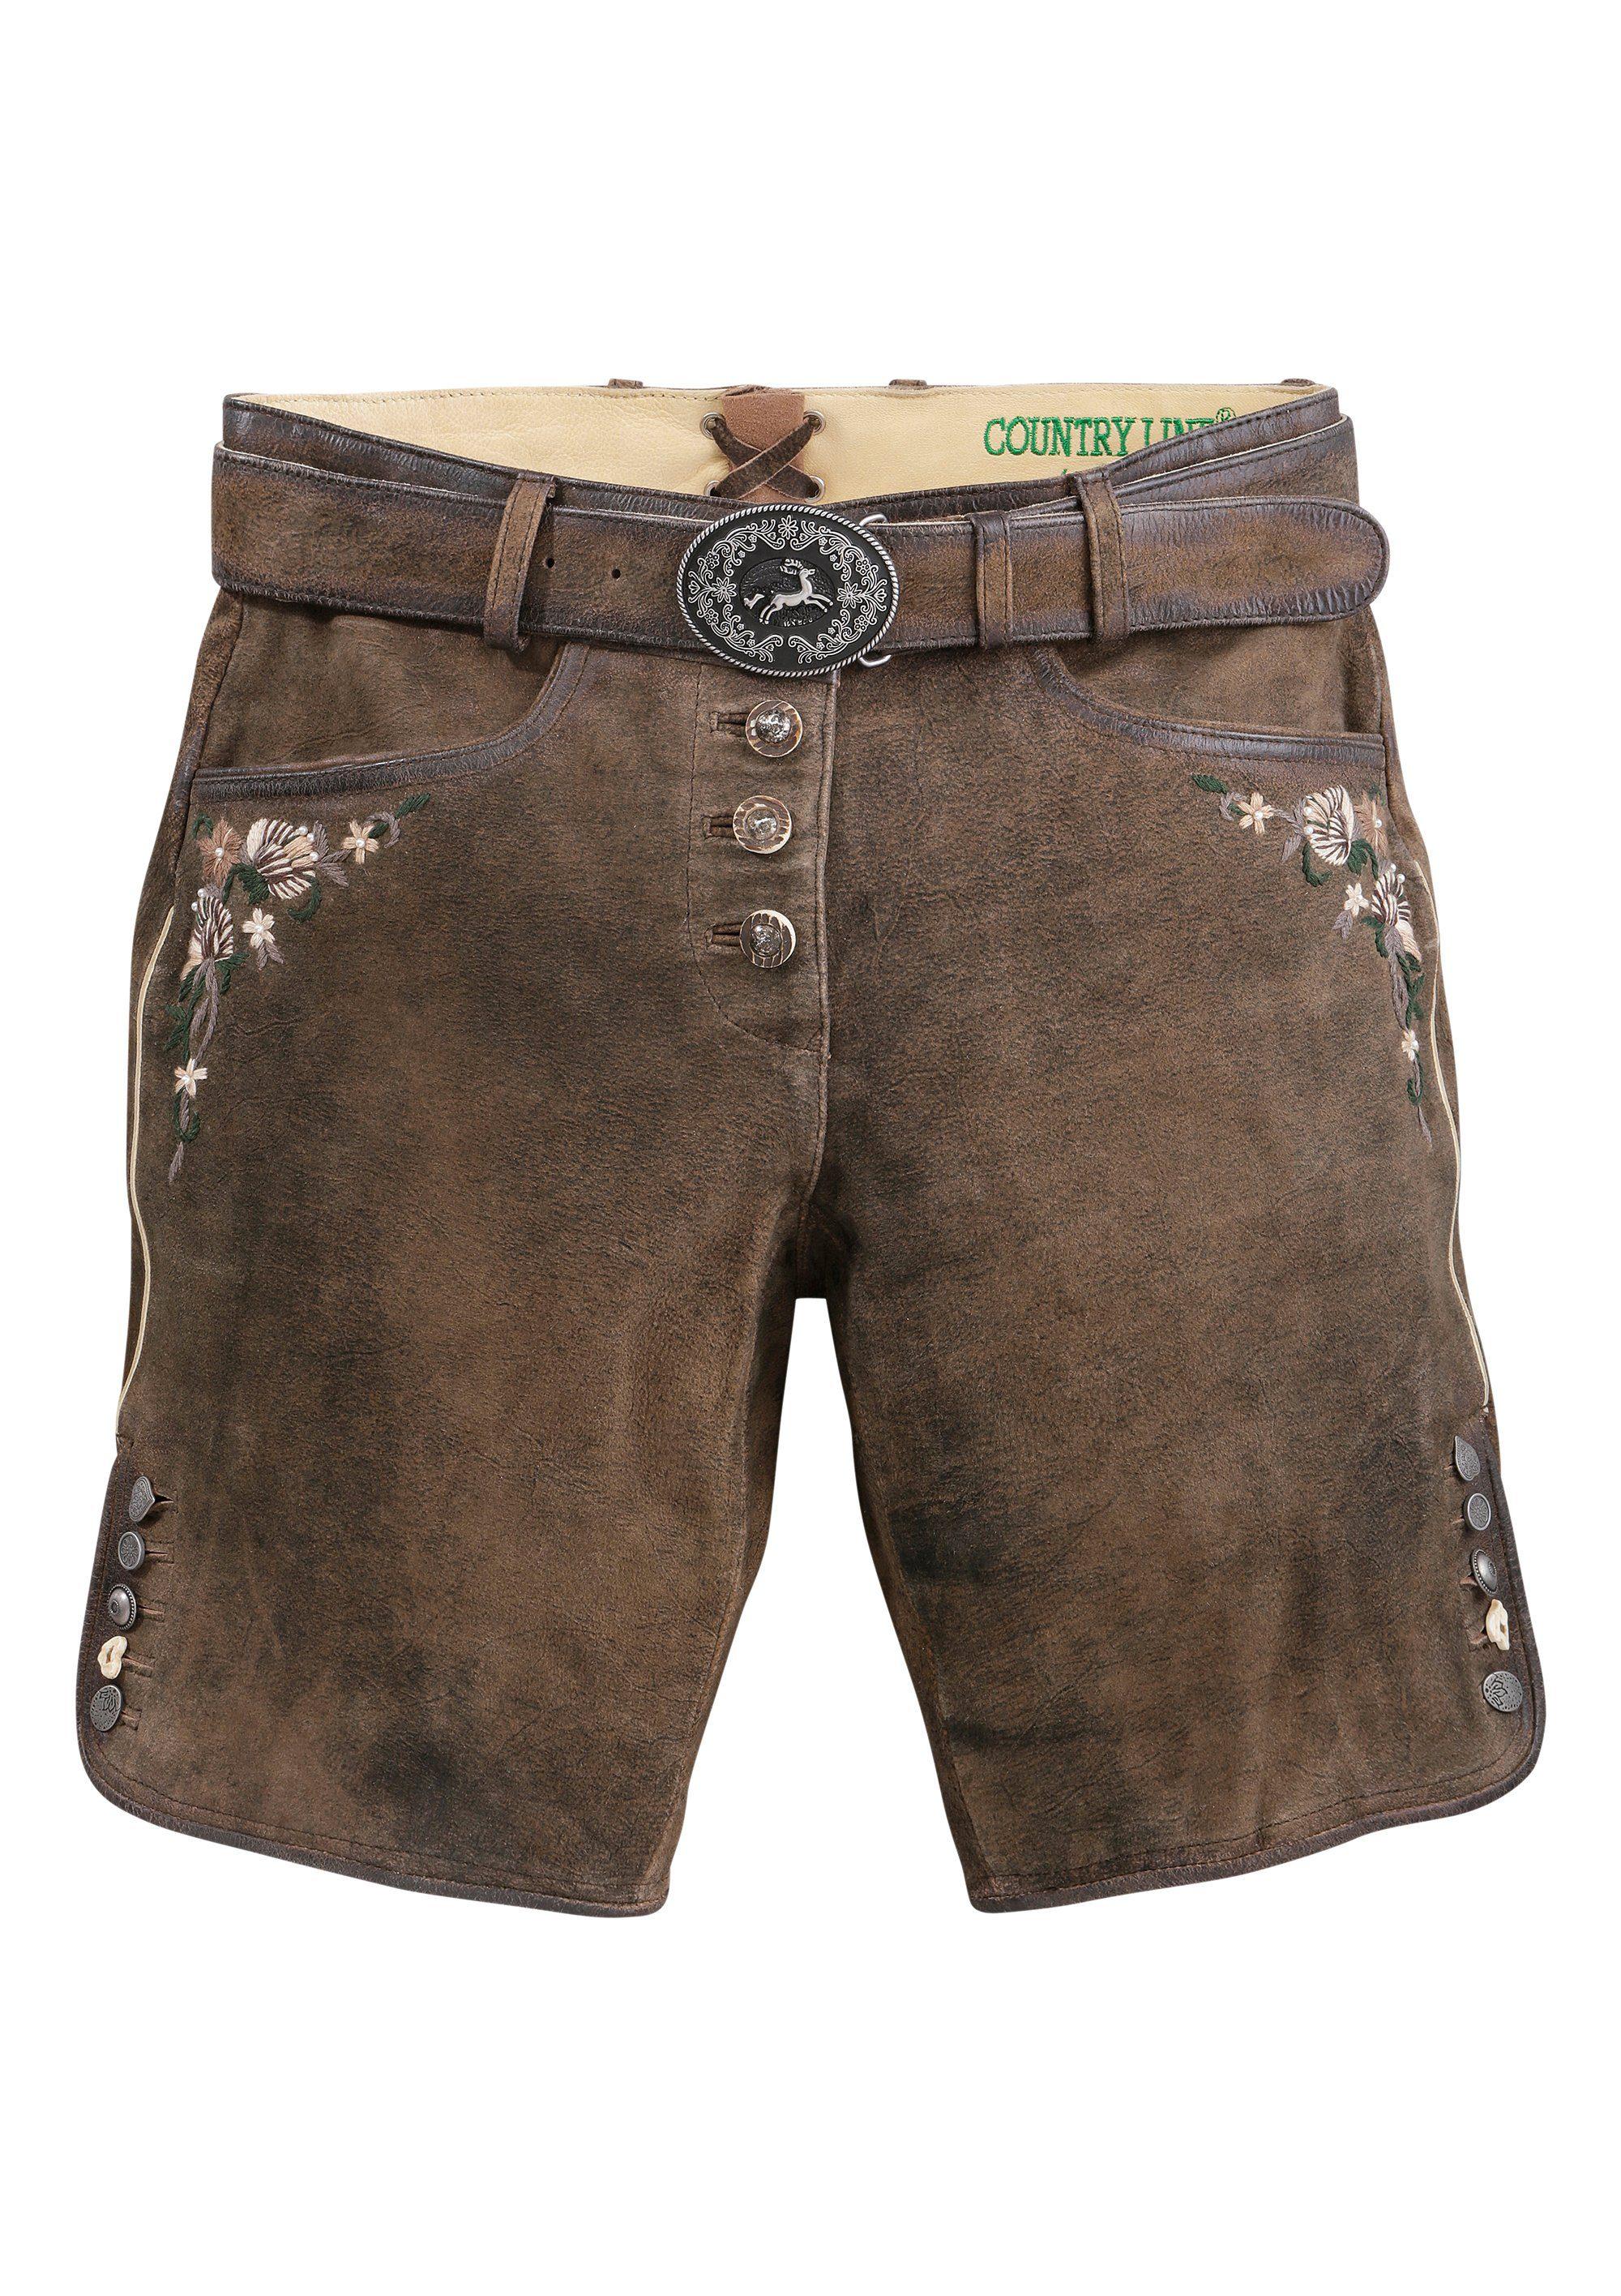 Country Line Trachtenlederhose kurz Damen mit Stickelementen | Bekleidung > Hosen > Lederhosen & Kunstlederhosen | Braun | Country Line